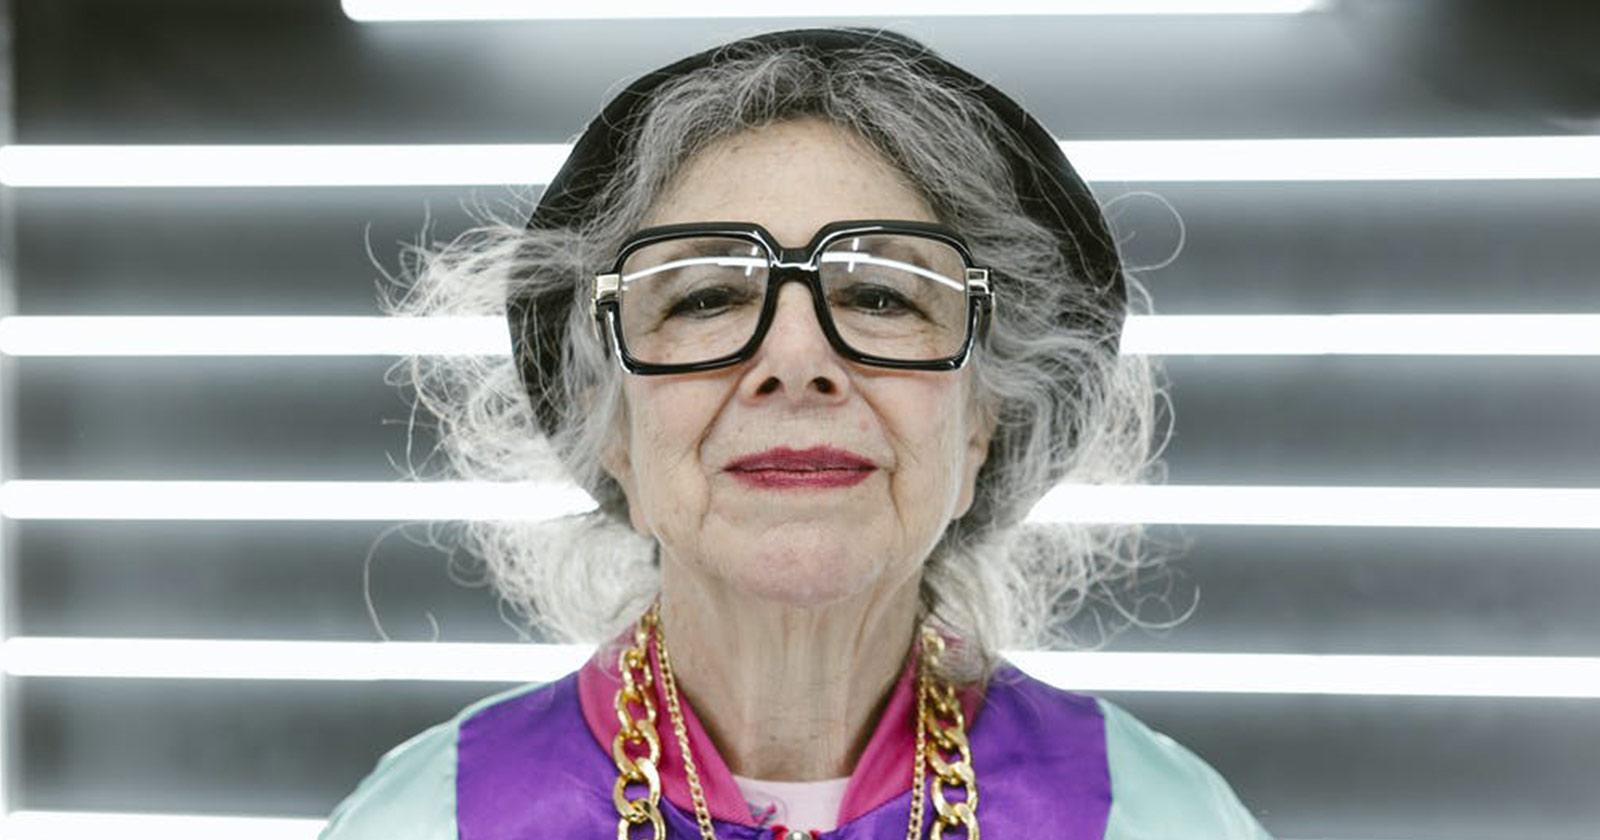 Finding Eyeglass Frames For Over 50-Year-Old Women | Vlookoptica